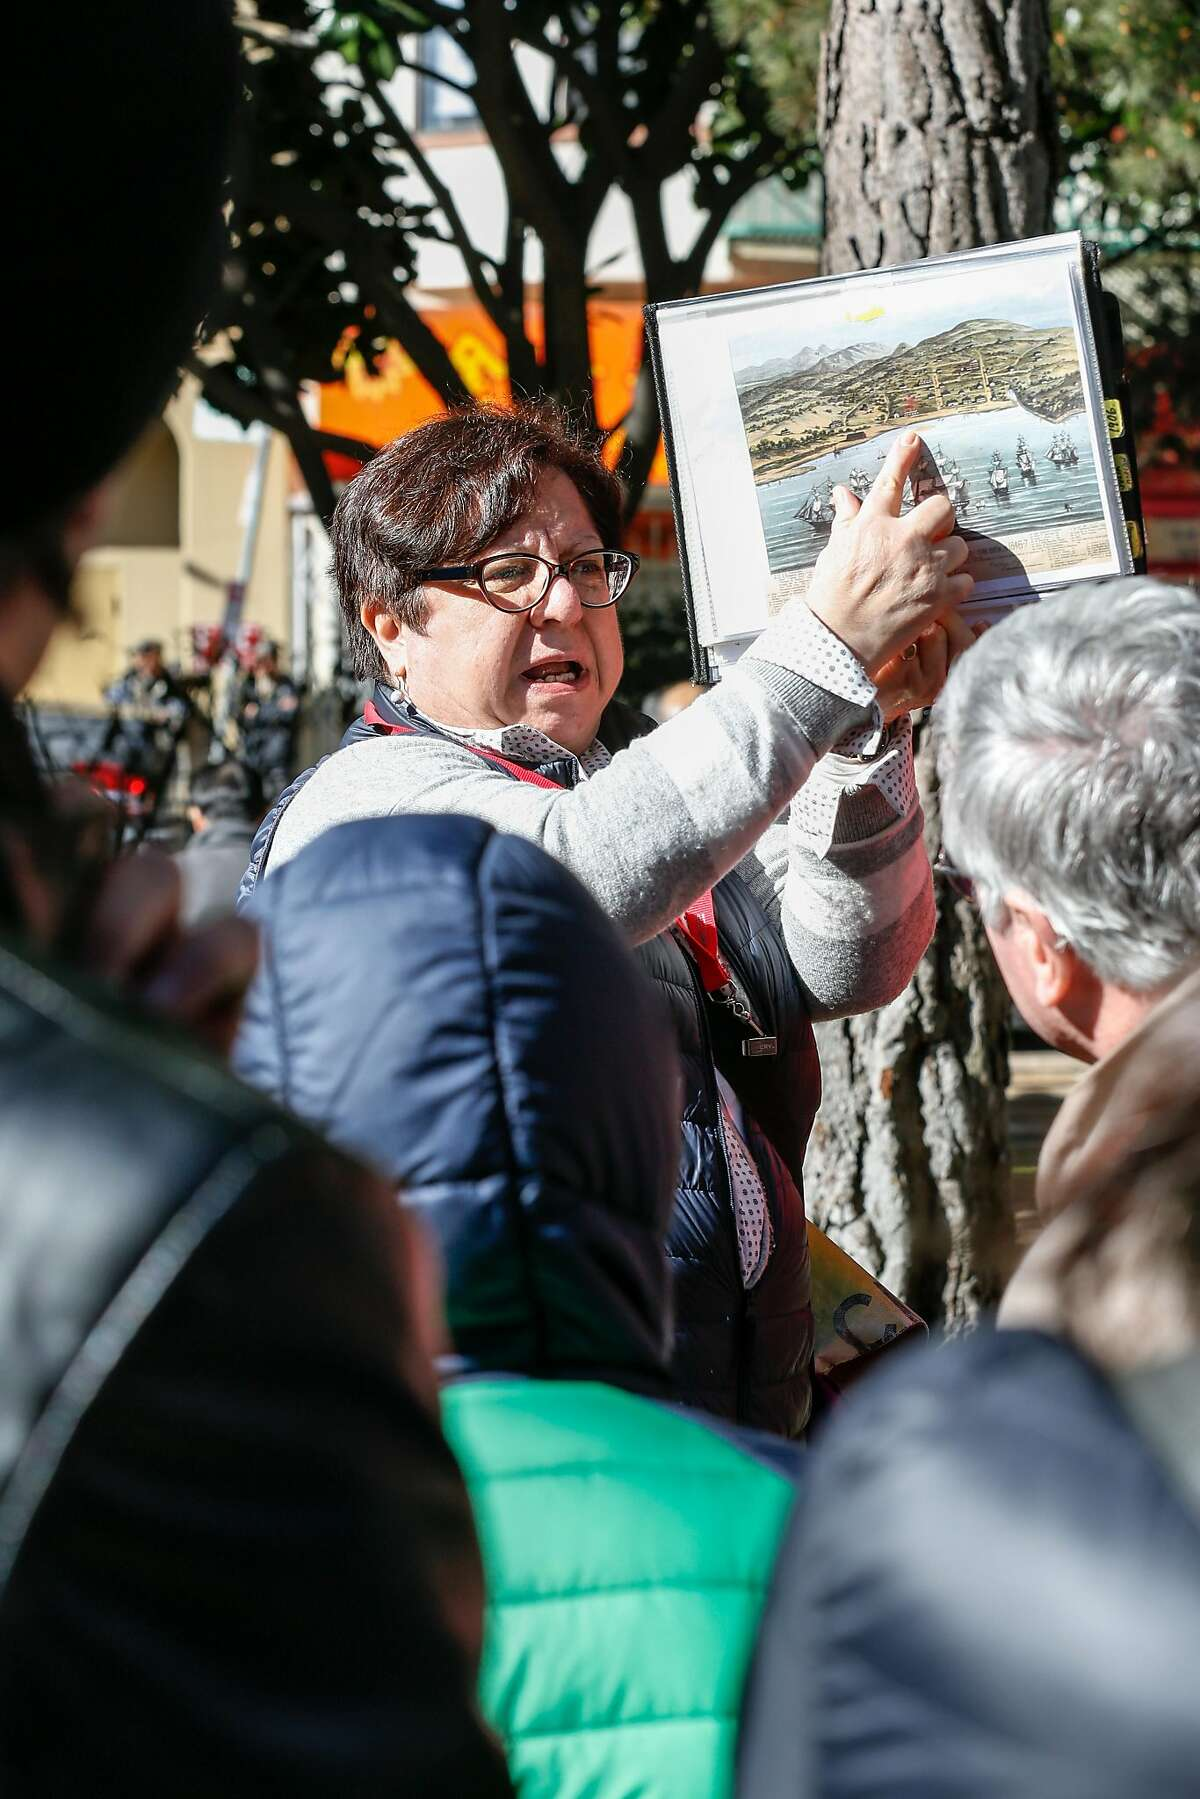 City Walks tour guide Nancy Rios gives a tour through Chinatown on Monday, February 19, 2018 in San Francisco, California.